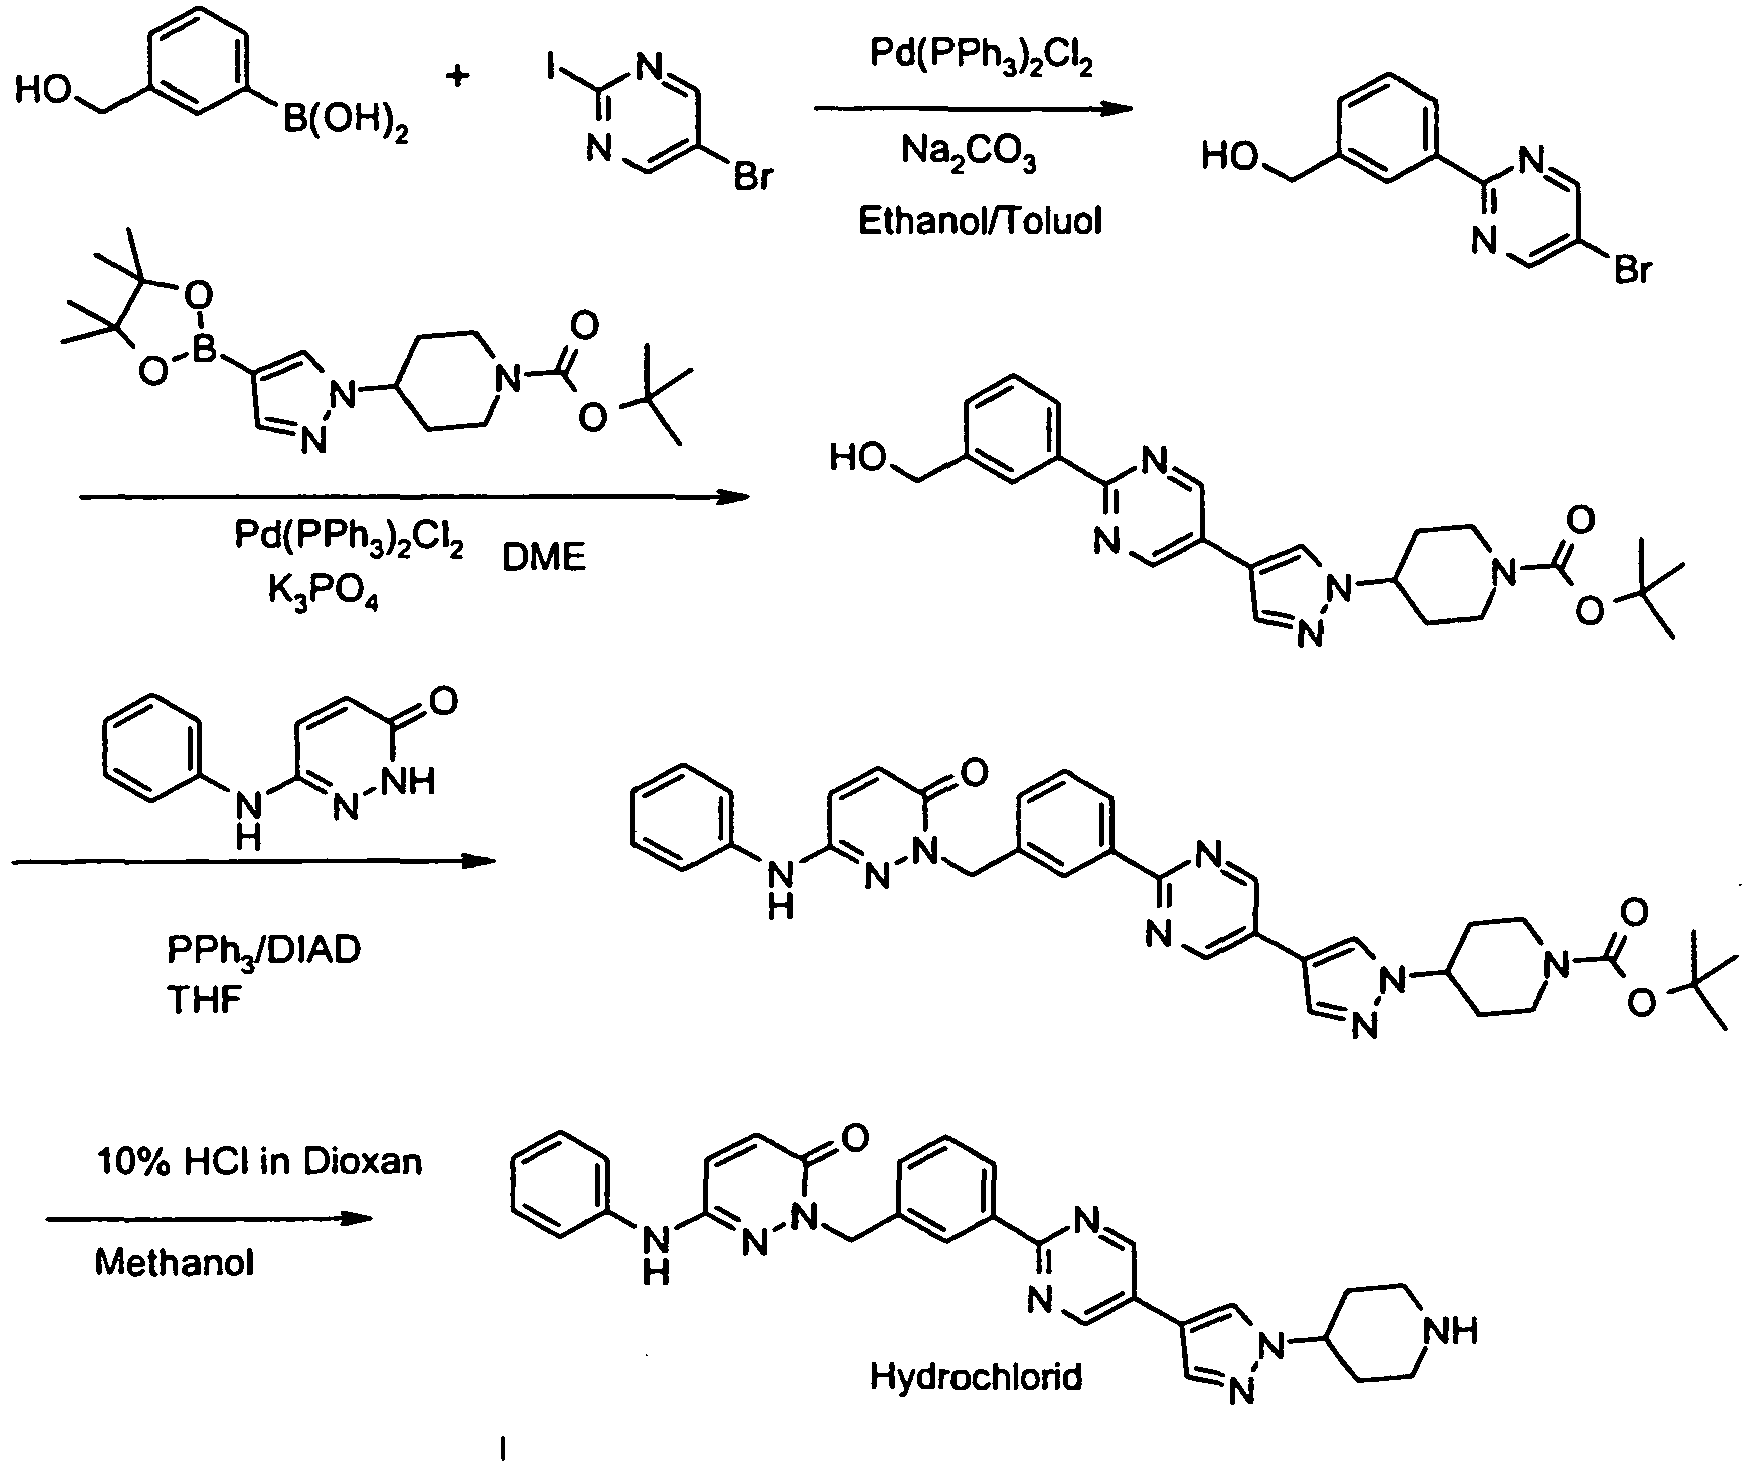 EP2373644B1 - Pyridazinone derivatives - Google Patents